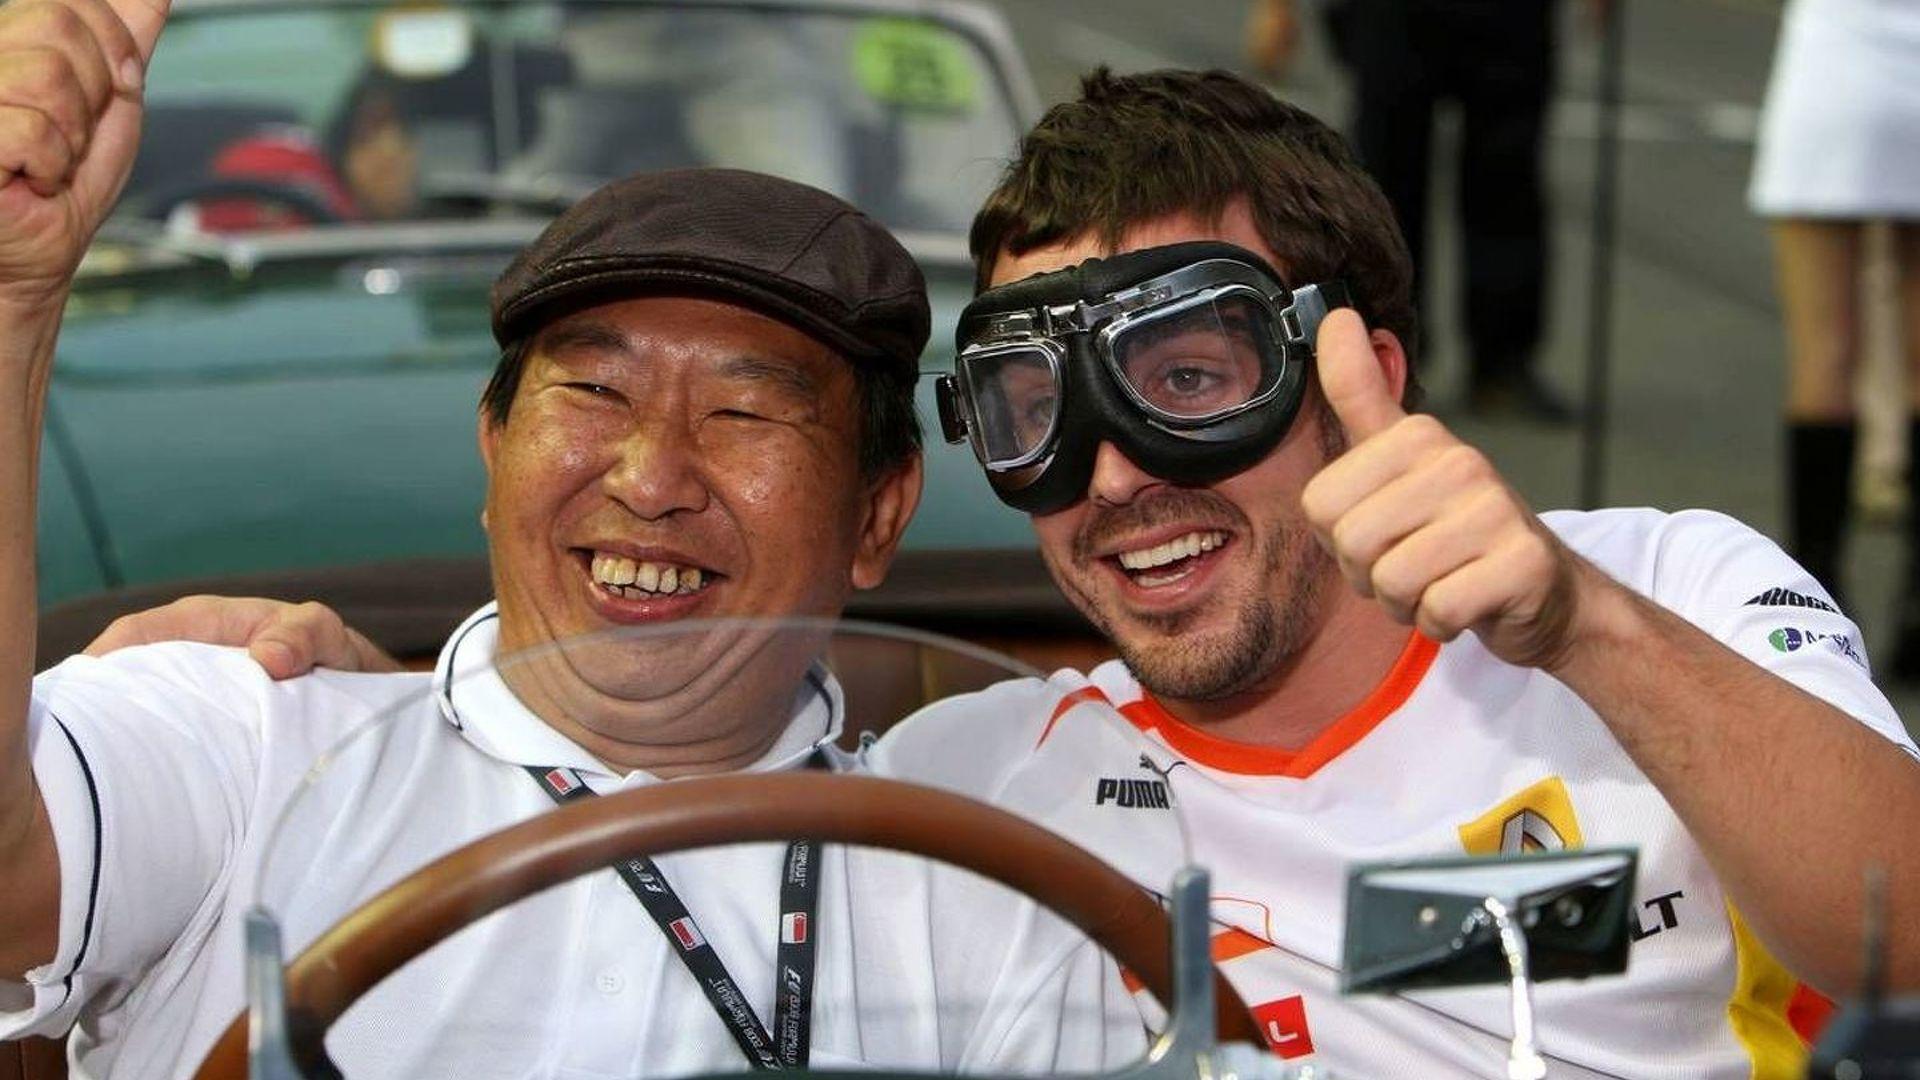 Ferrari near 'guarantee' of success - Alonso